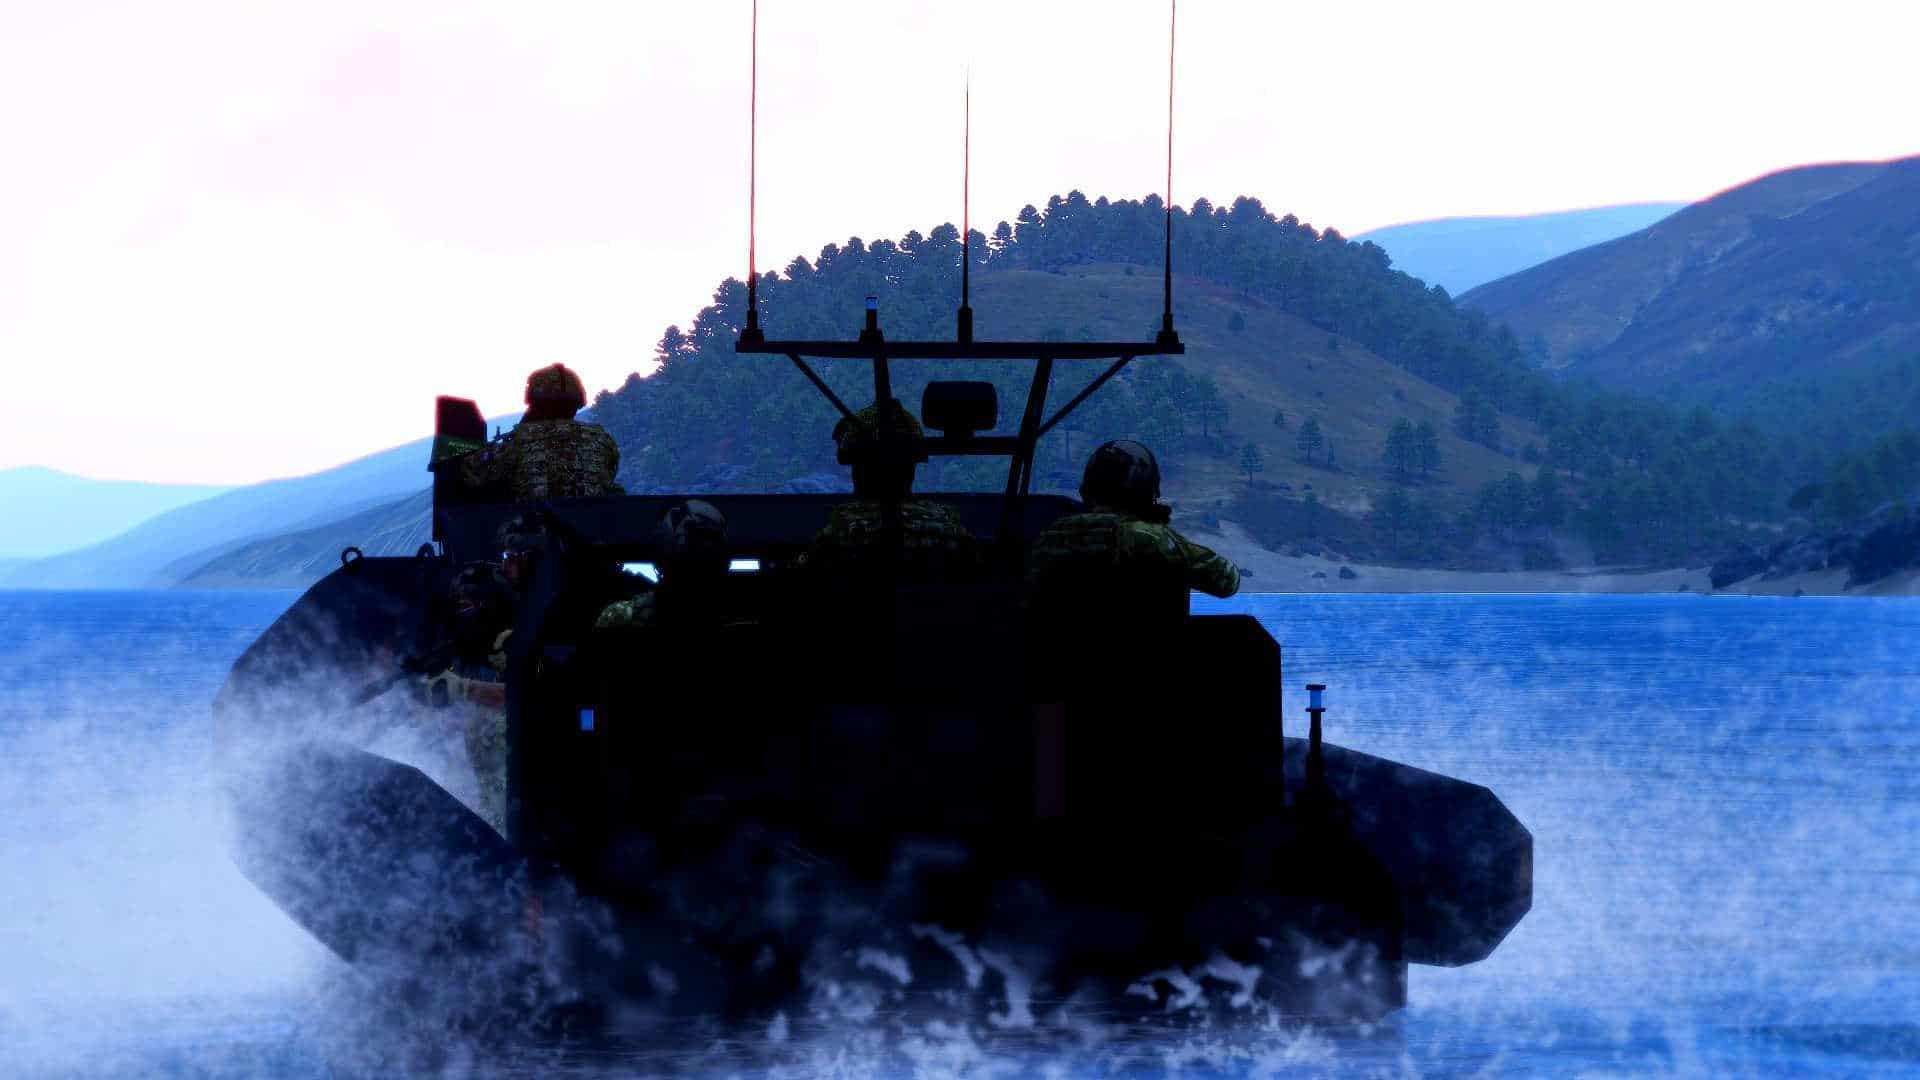 Arma 3 boat